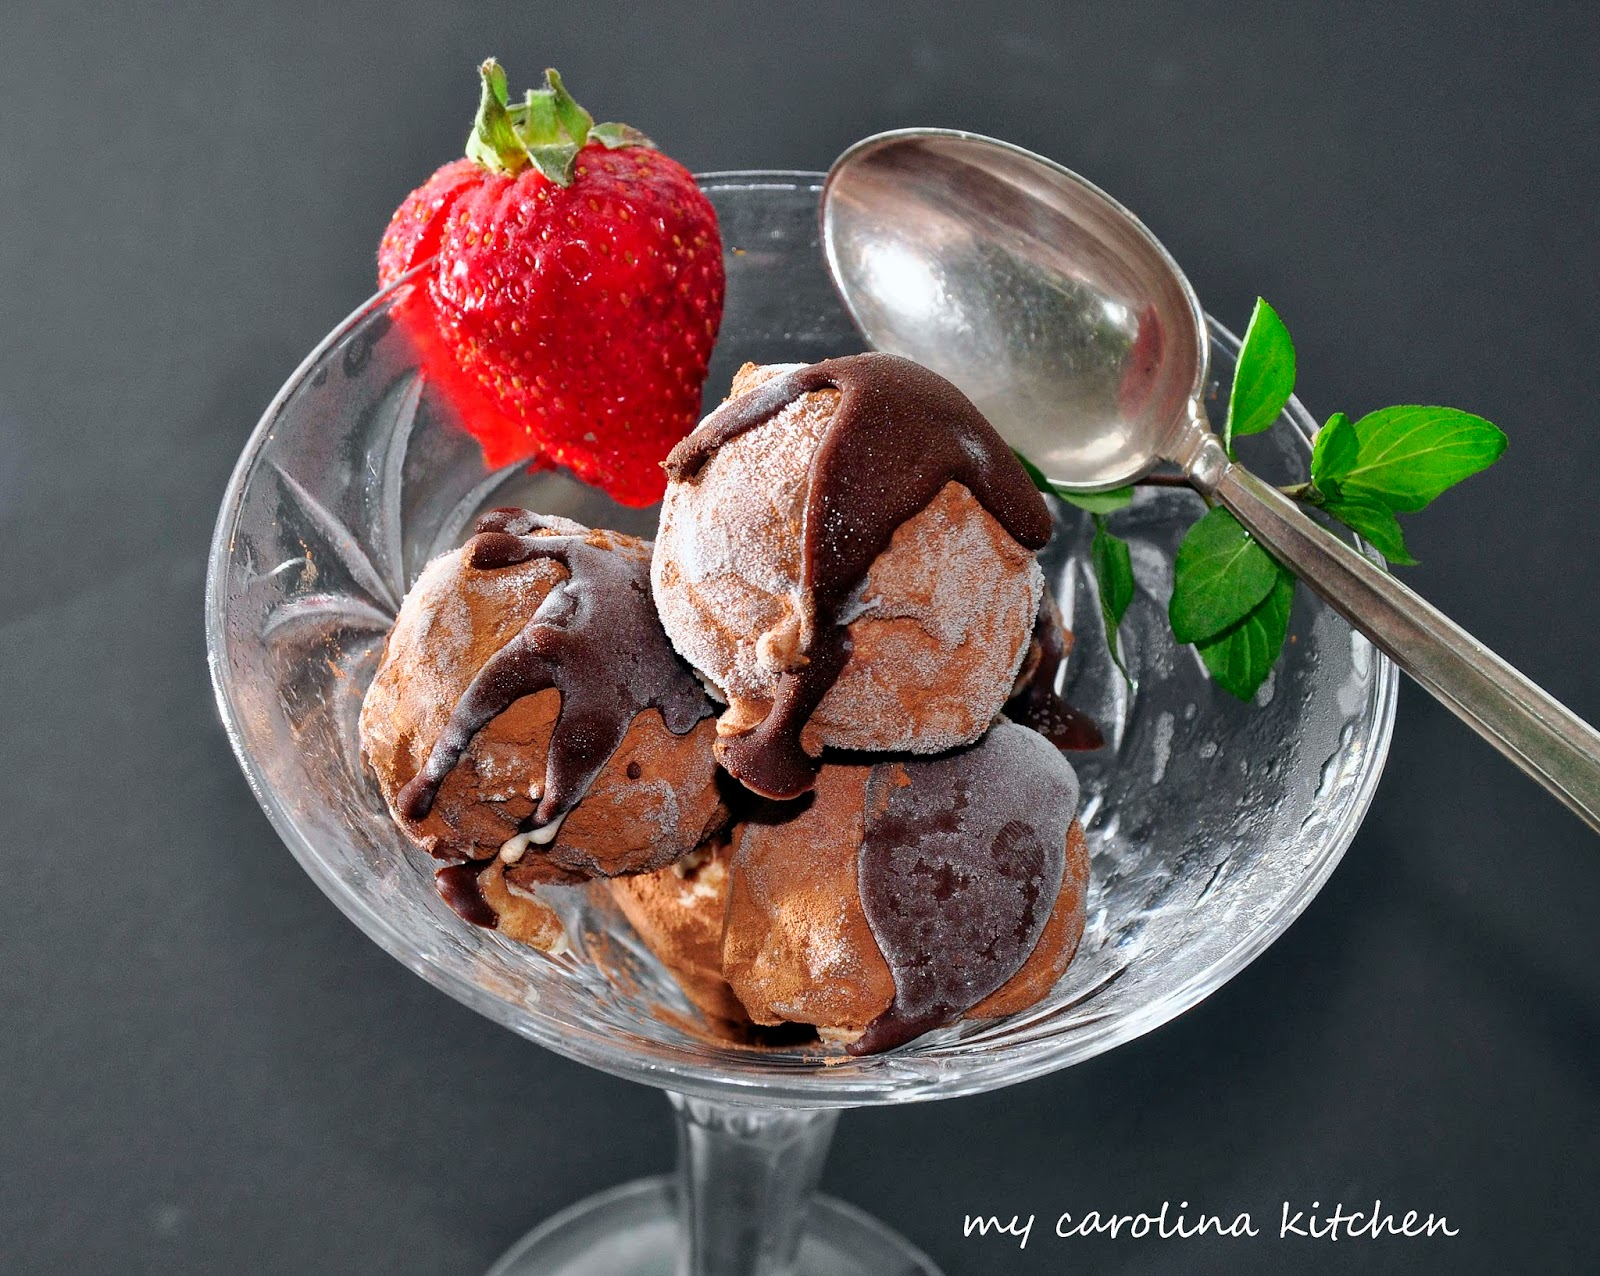 My Carolina Kitchen: Frozen Chocolate Truffles